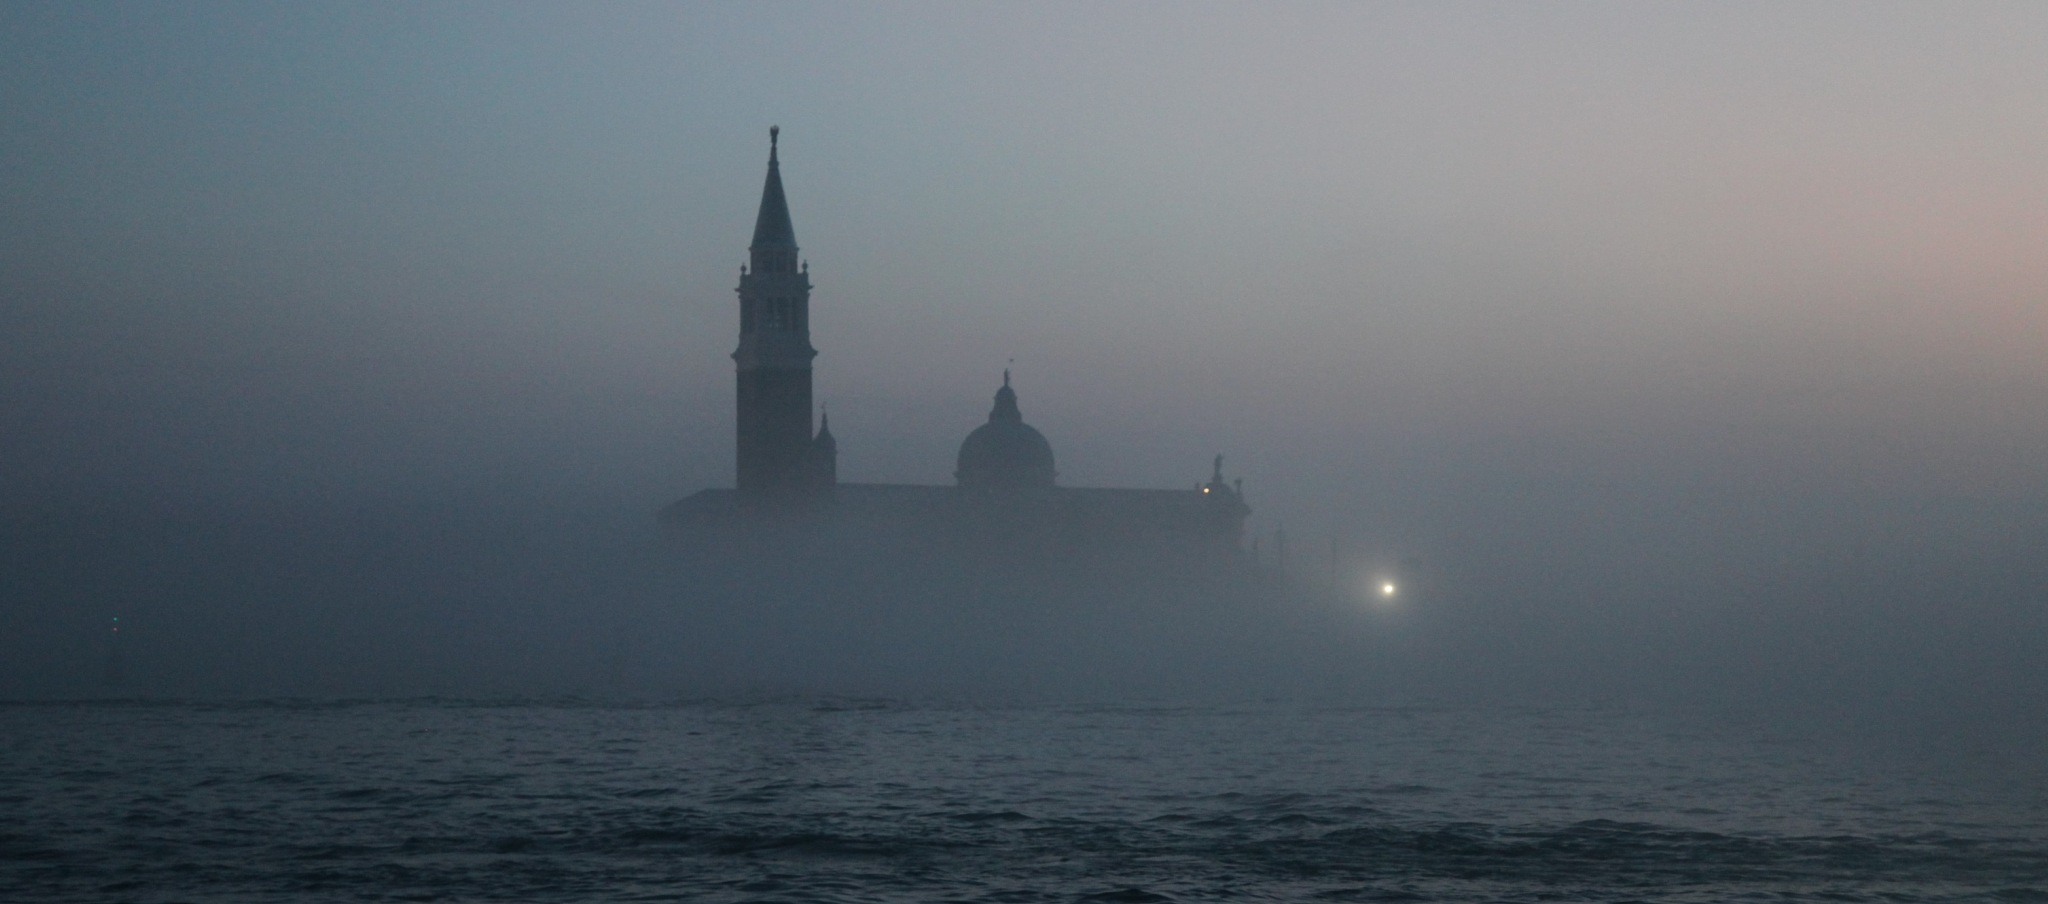 My Venice by simone.bacco.12